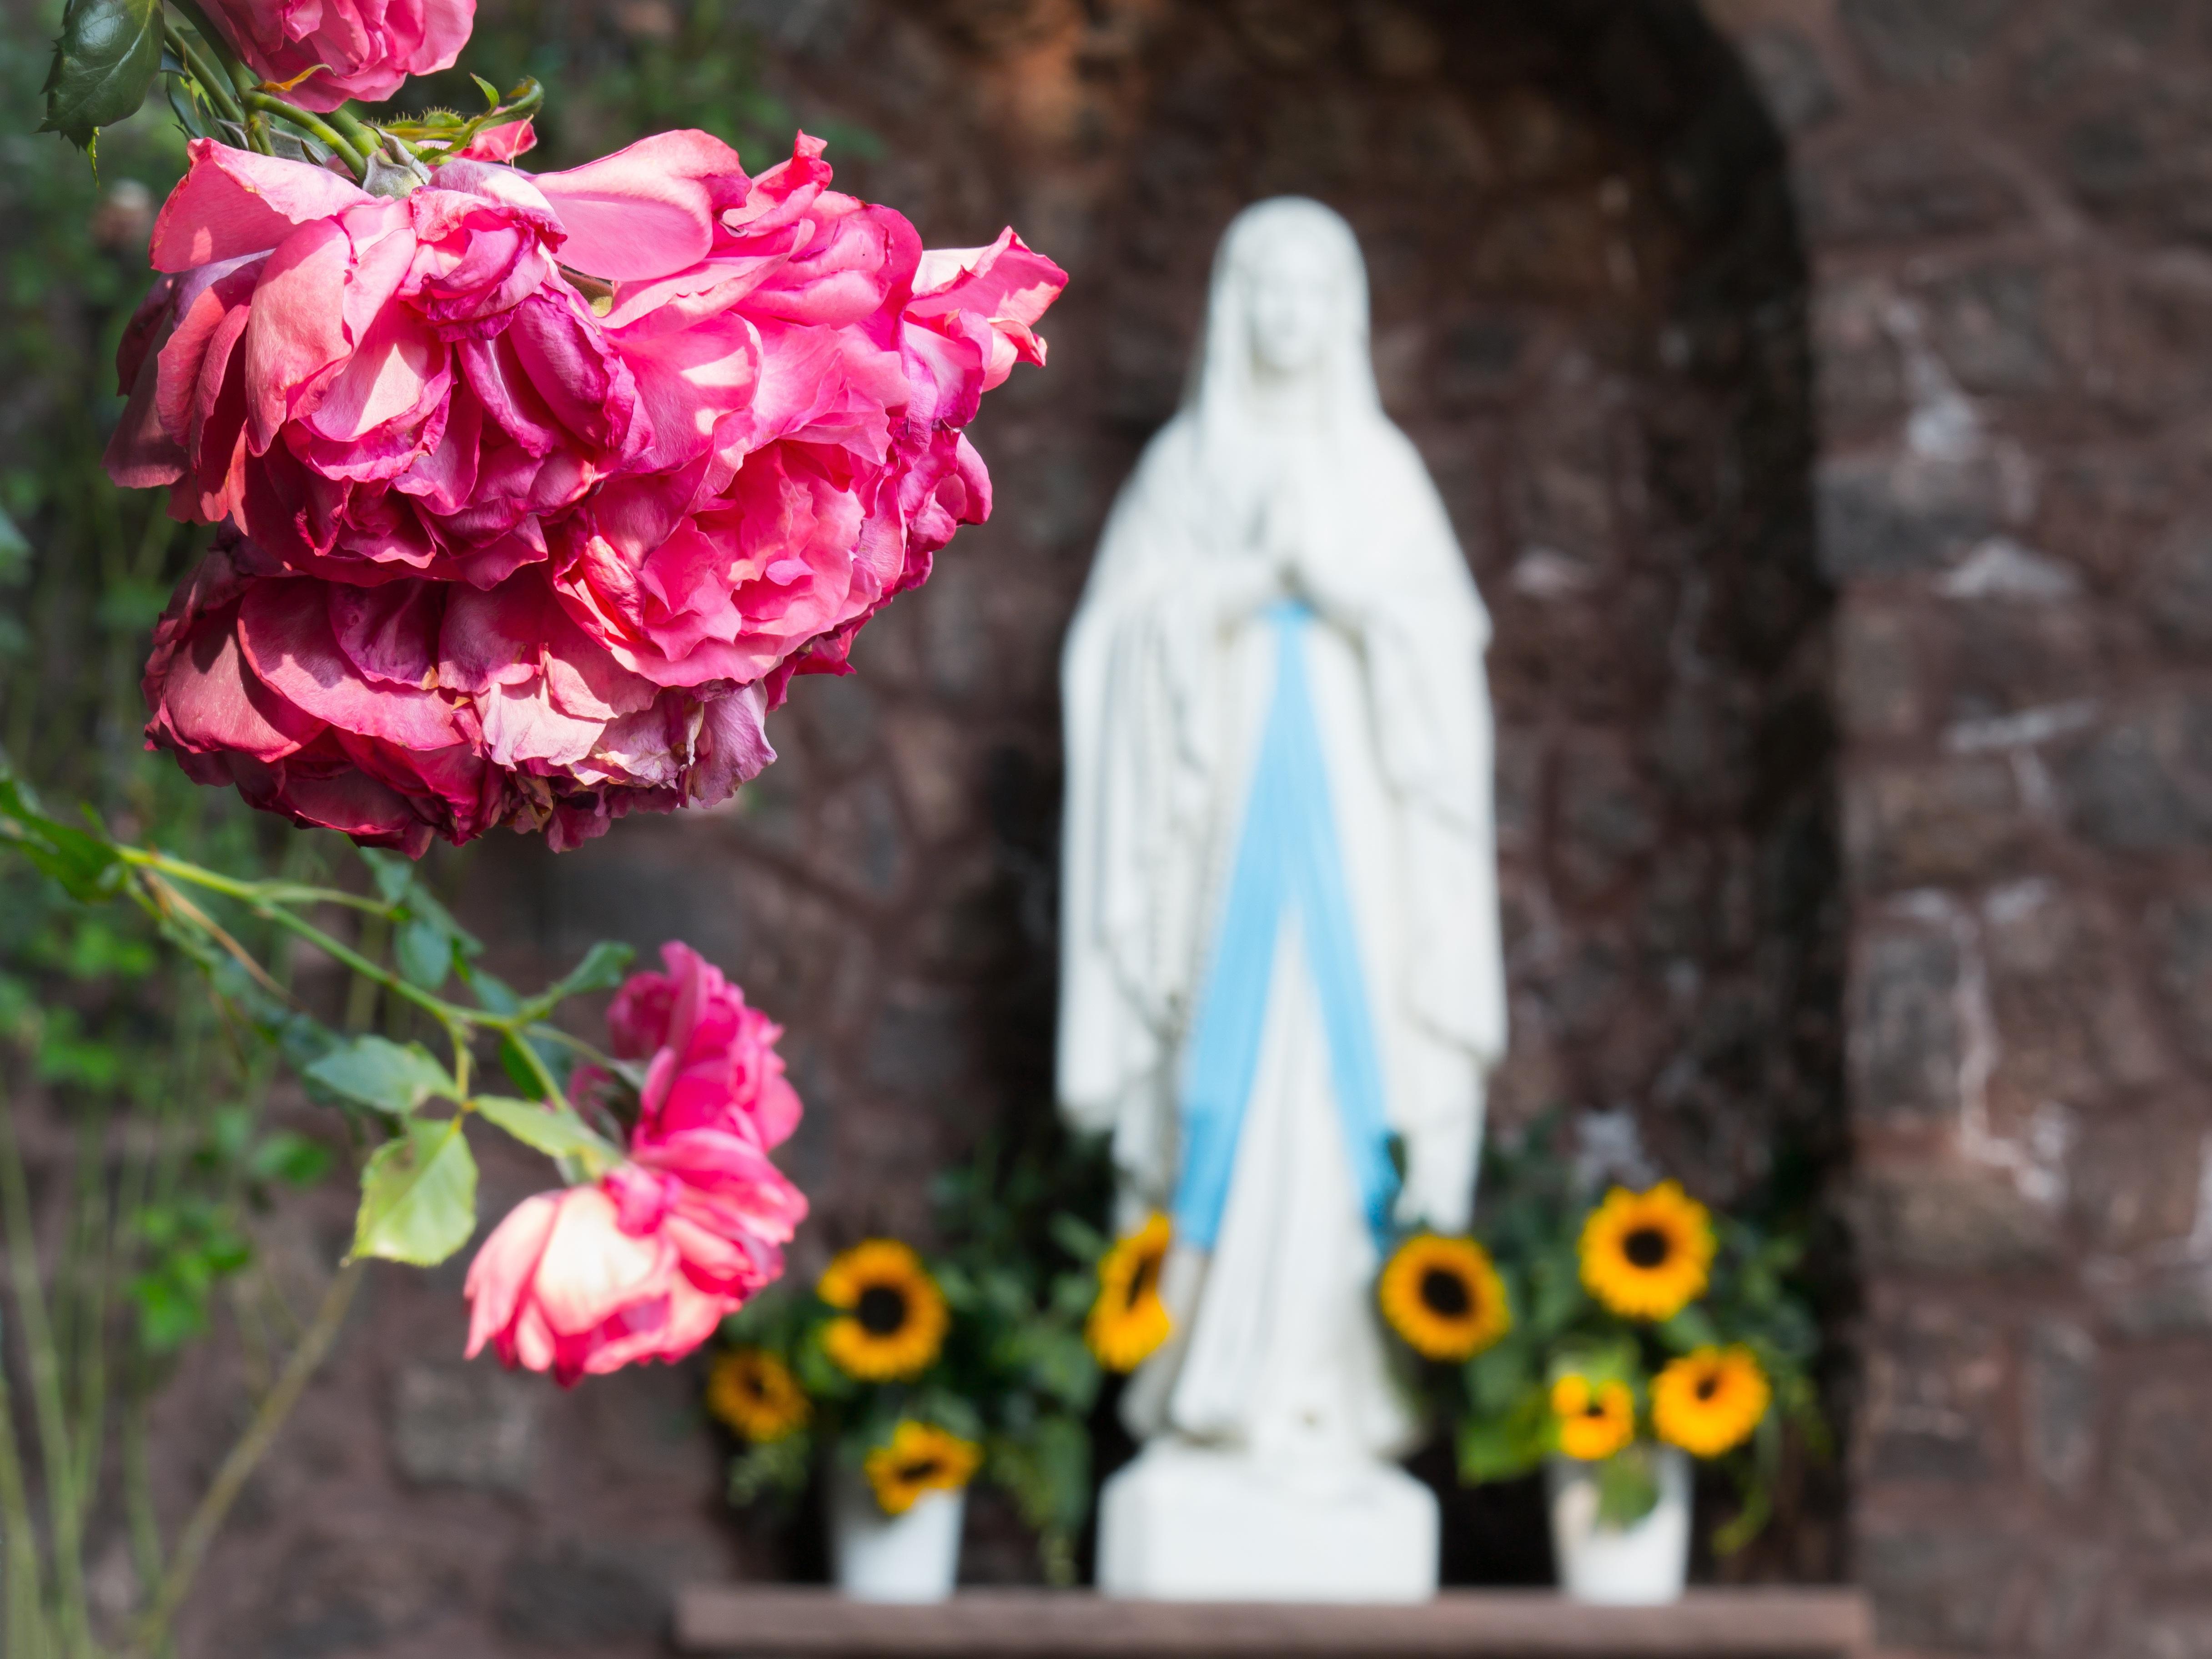 Fotos Gratis Planta Flor Estatua Rosa Primavera